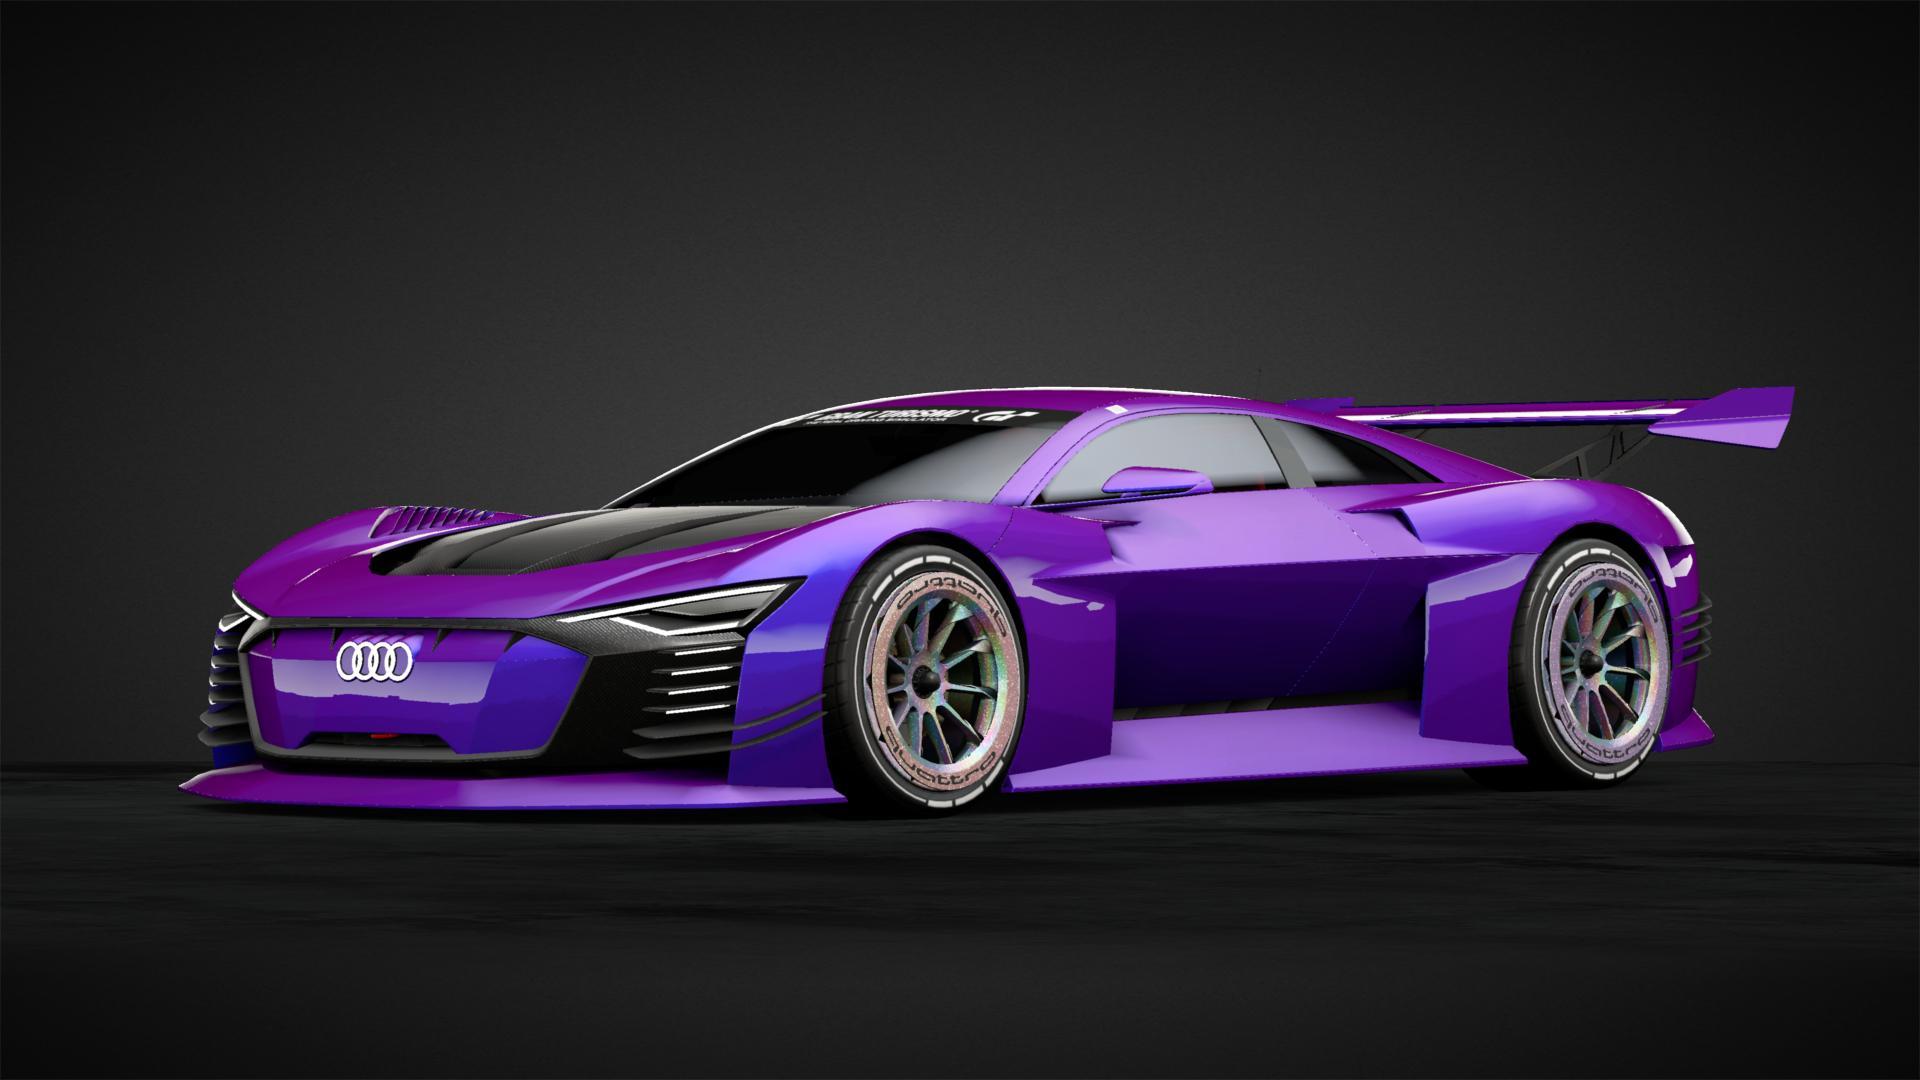 Audi E Tron Vgt Color Concept Car Livery By Rhin0s Community